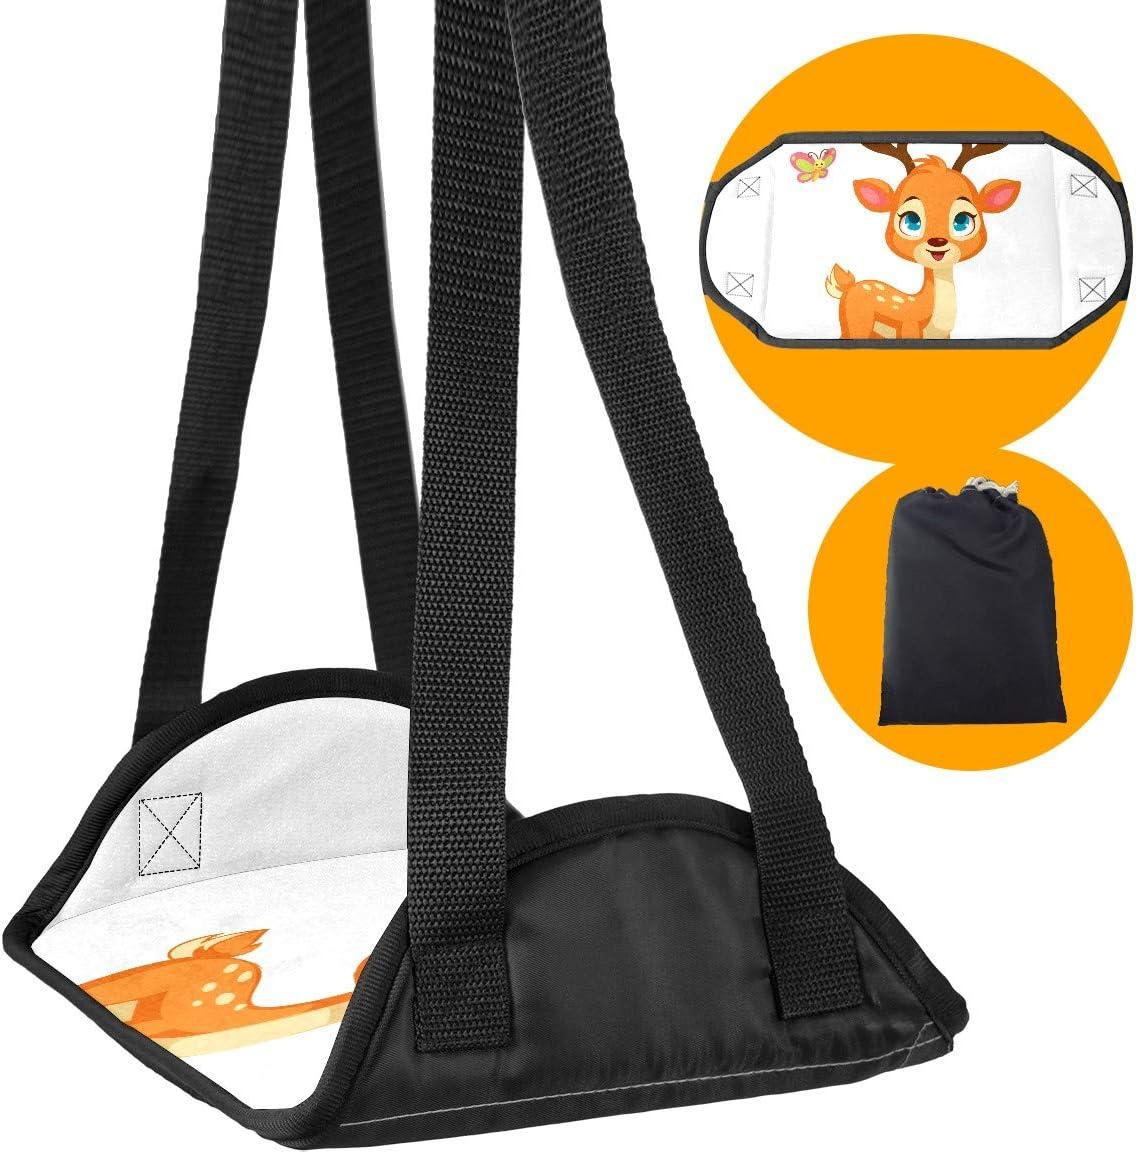 Foot Popular standard Hammock Desk Footrest Max 69% OFF Portable Comfy Bab Hanger,Cute